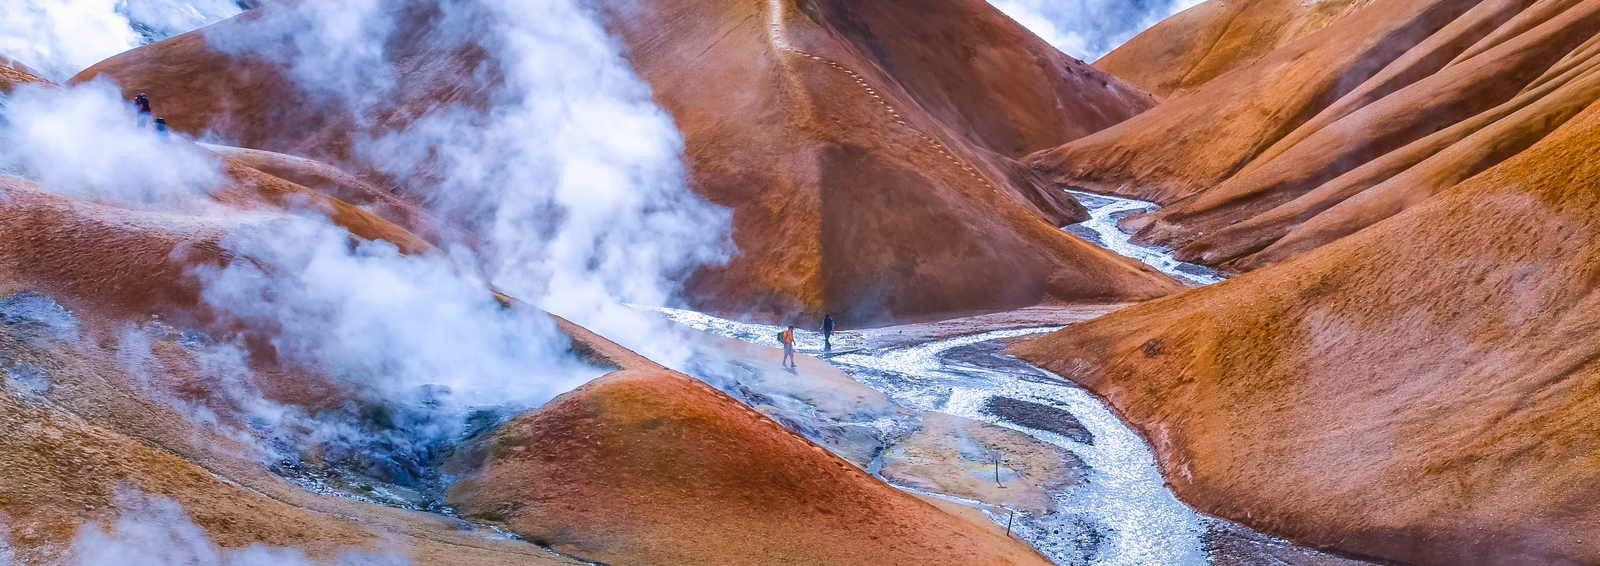 Geothermal smoking field with people, Kerlingafjoll